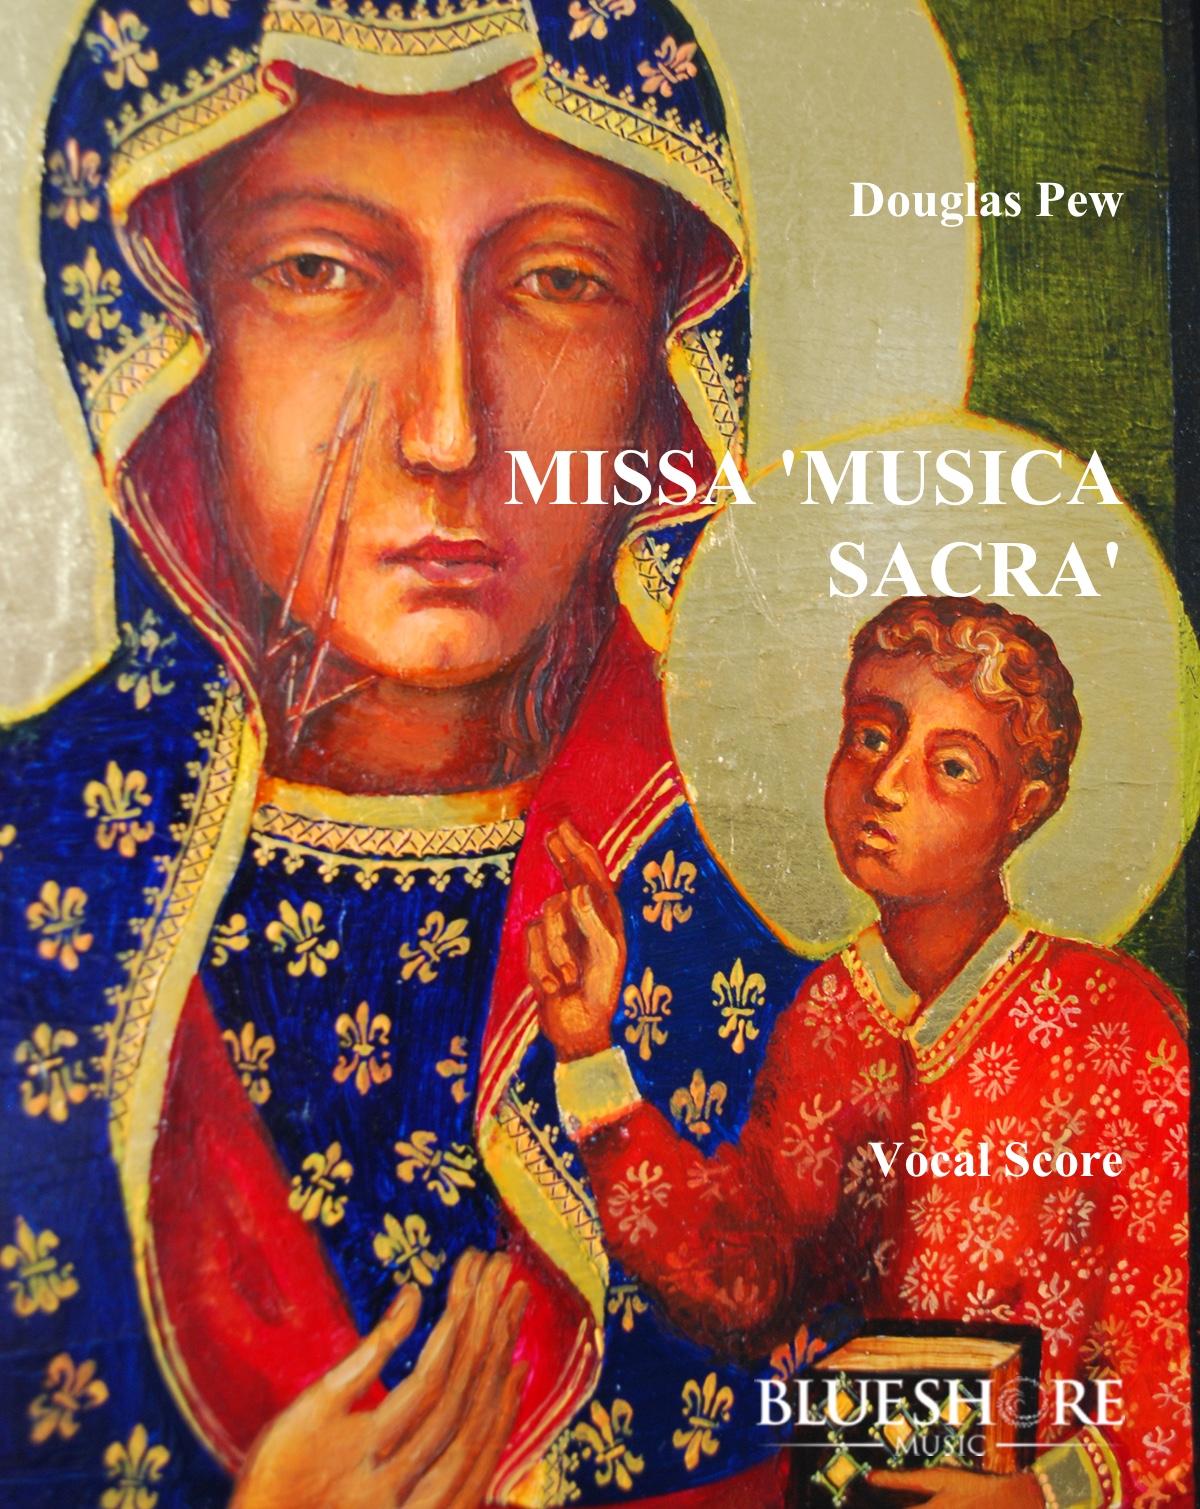 Missa 'Musica Sacra' , for SATB and Organ, or Double Chorus a cappella